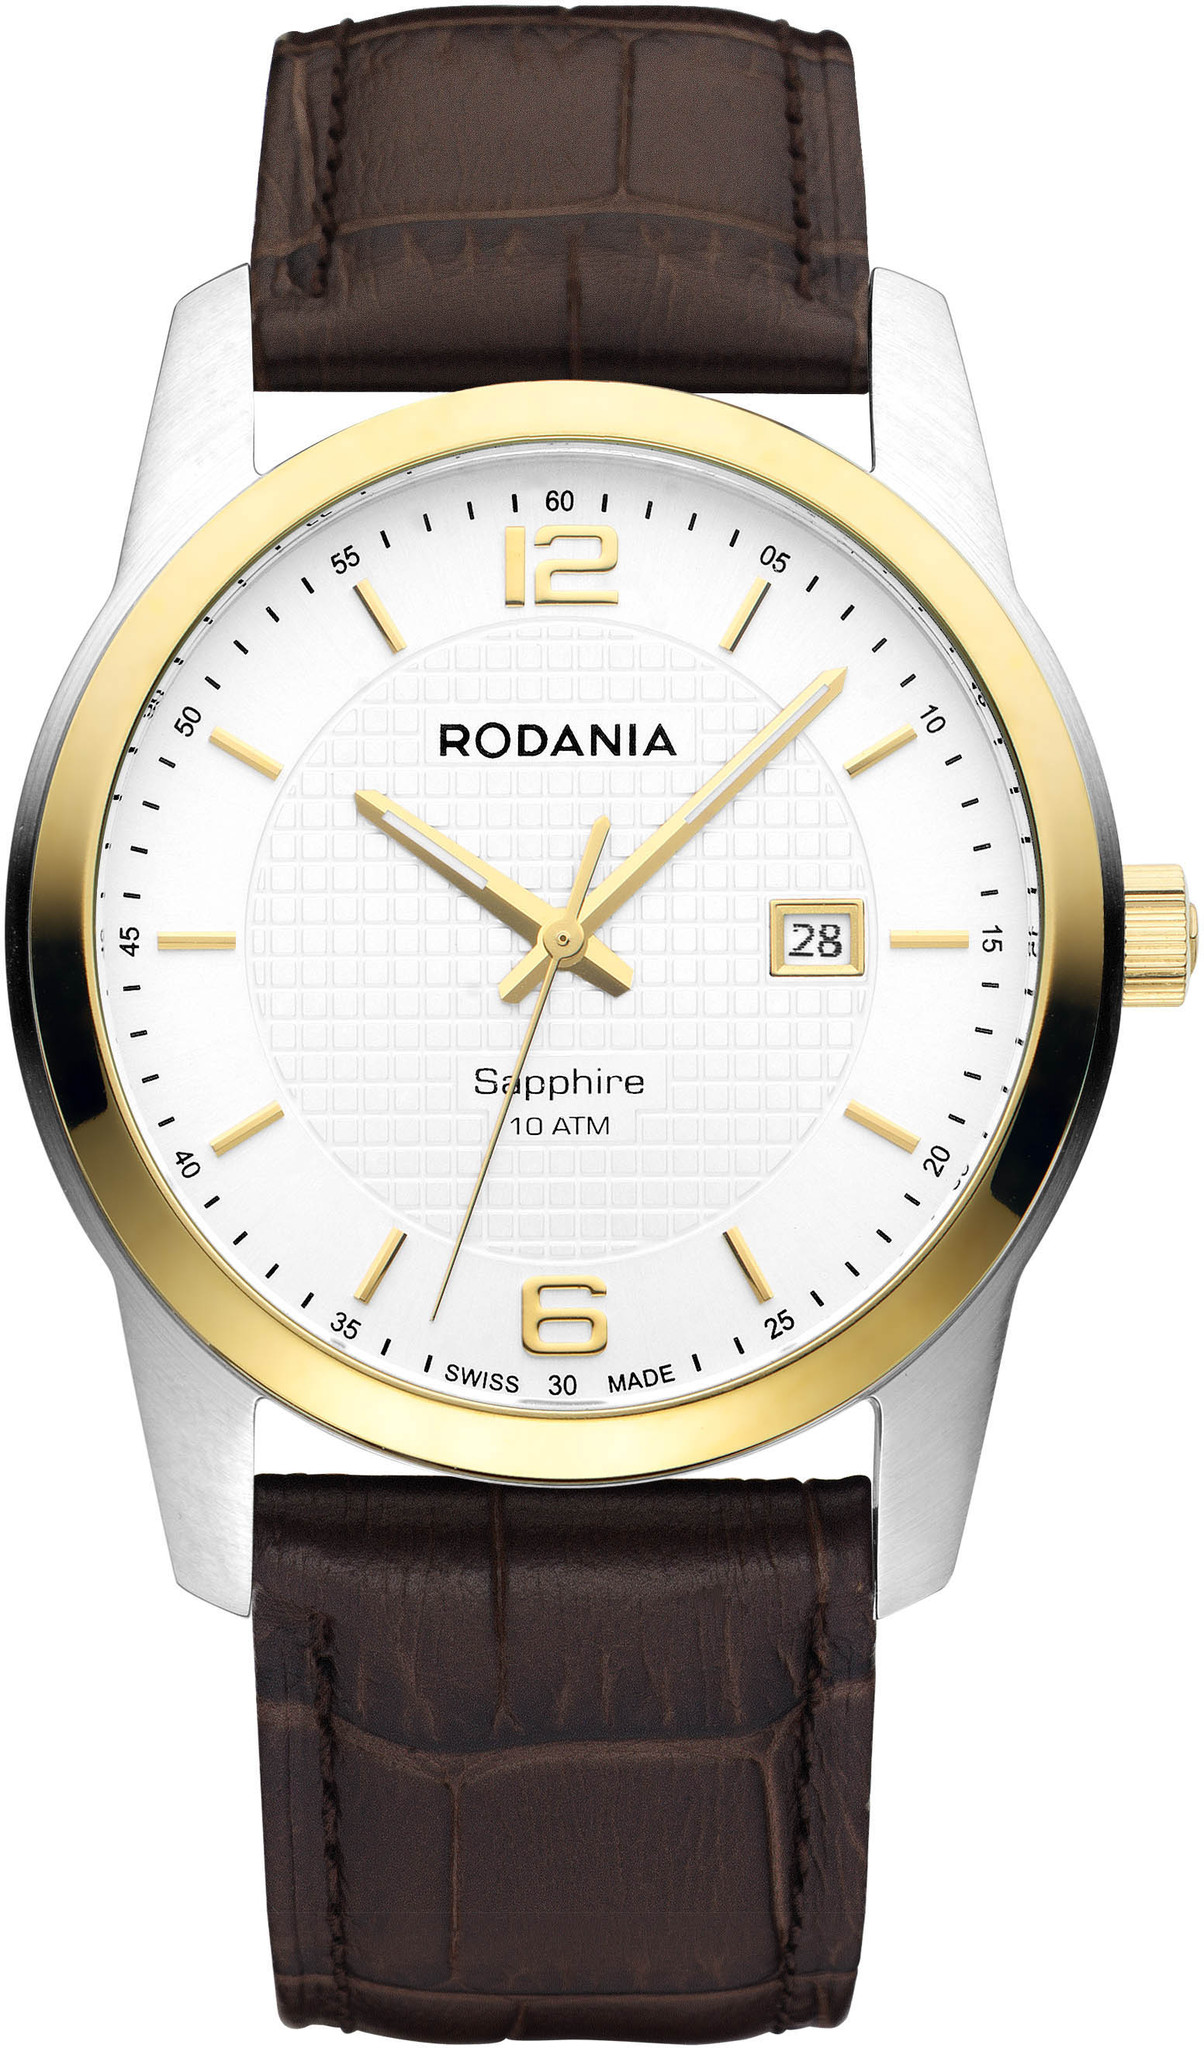 Rodania 25110.70 - мужские наручные часы из коллекции VANCOUVERRodania<br><br><br>Бренд: Rodania<br>Модель: Rodania 25110.70<br>Артикул: 25110.70<br>Вариант артикула: None<br>Коллекция: VANCOUVER<br>Подколлекция: None<br>Страна: Швейцария<br>Пол: мужские<br>Тип механизма: кварцевые<br>Механизм: Ronda 505<br>Количество камней: None<br>Автоподзавод: None<br>Источник энергии: от батарейки<br>Срок службы элемента питания: None<br>Дисплей: стрелки<br>Цифры: арабские<br>Водозащита: WR 100<br>Противоударные: None<br>Материал корпуса: нерж. сталь, IP покрытие (частичное)<br>Материал браслета: кожа<br>Материал безеля: None<br>Стекло: сапфировое<br>Антибликовое покрытие: None<br>Цвет корпуса: None<br>Цвет браслета: None<br>Цвет циферблата: None<br>Цвет безеля: None<br>Размеры: 40 мм<br>Диаметр: None<br>Диаметр корпуса: None<br>Толщина: None<br>Ширина ремешка: None<br>Вес: None<br>Спорт-функции: None<br>Подсветка: None<br>Вставка: None<br>Отображение даты: число<br>Хронограф: None<br>Таймер: None<br>Термометр: None<br>Хронометр: None<br>GPS: None<br>Радиосинхронизация: None<br>Барометр: None<br>Скелетон: None<br>Дополнительная информация: None<br>Дополнительные функции: None